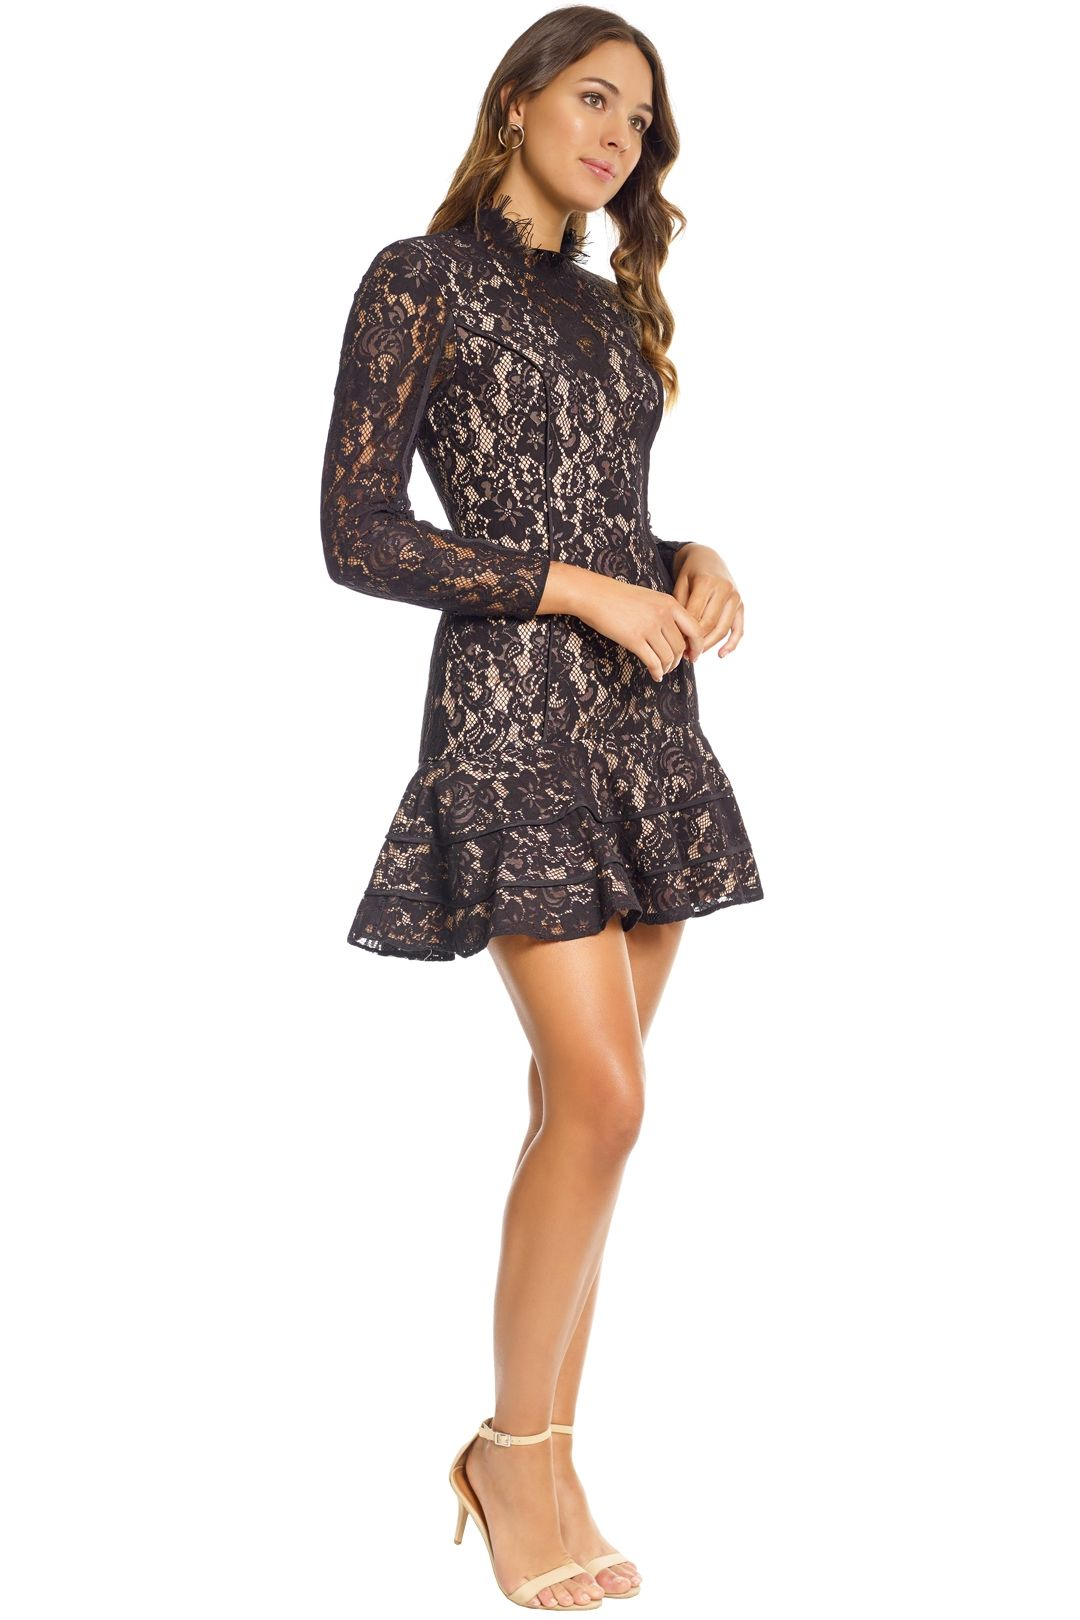 Keepsake the Label - Dreamers LS Lace Mini Dress - Black - Side